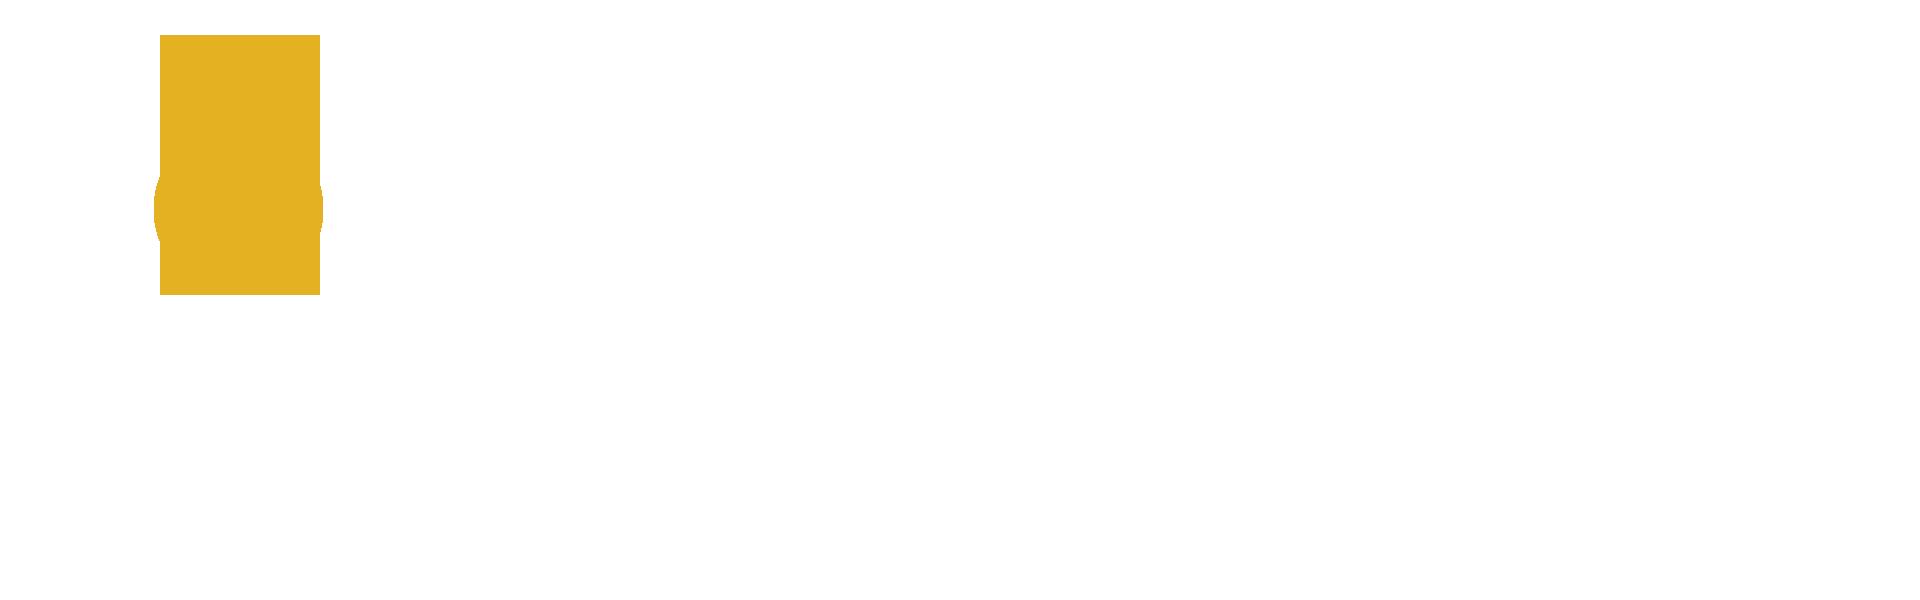 Diapos-Slider-logo-max-2